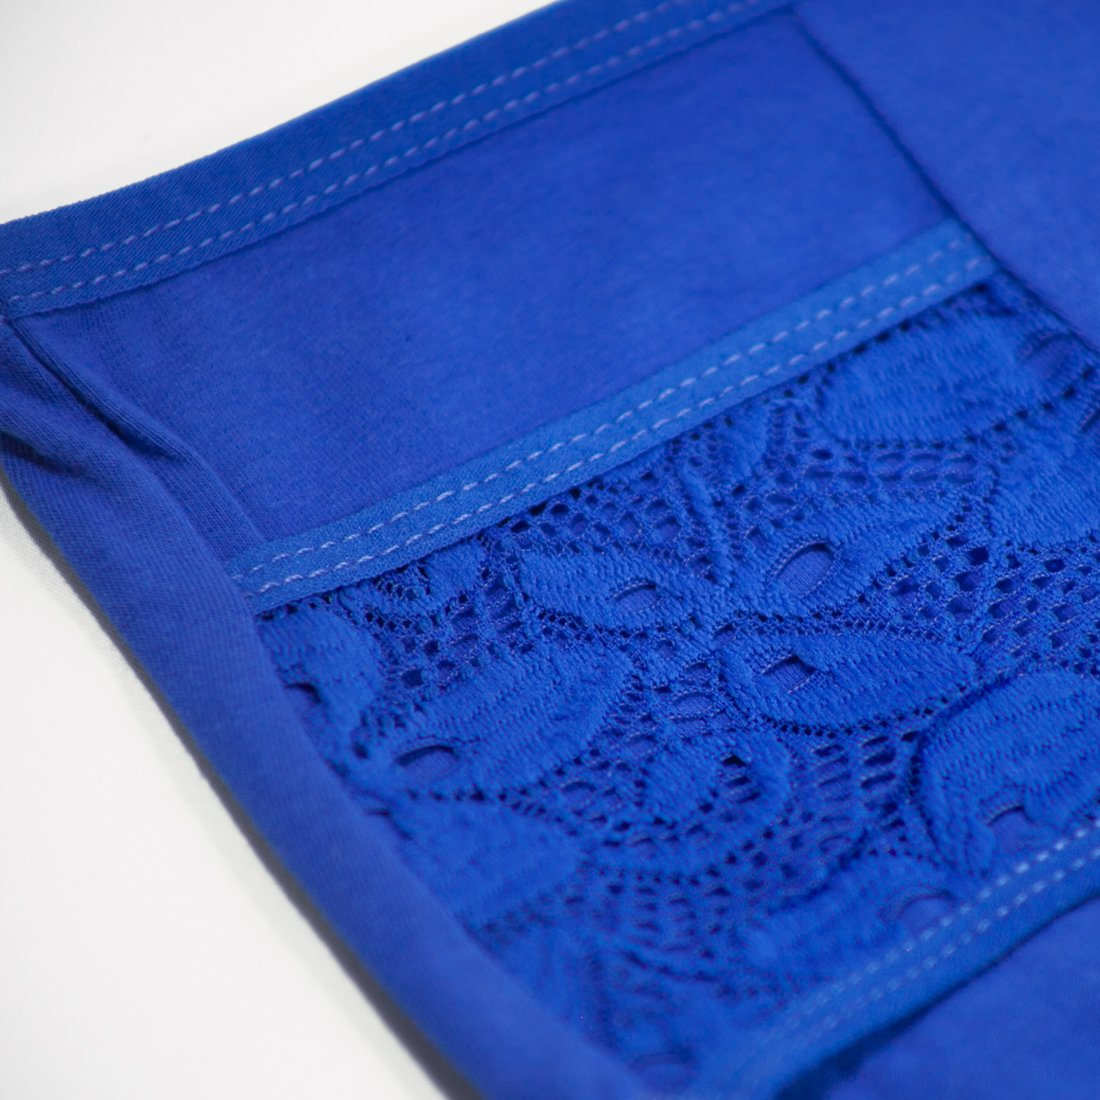 Love Hana Women's Lace Plus Size Brief Panties 4-Pack - XXXL by Love Hana (Image #5)